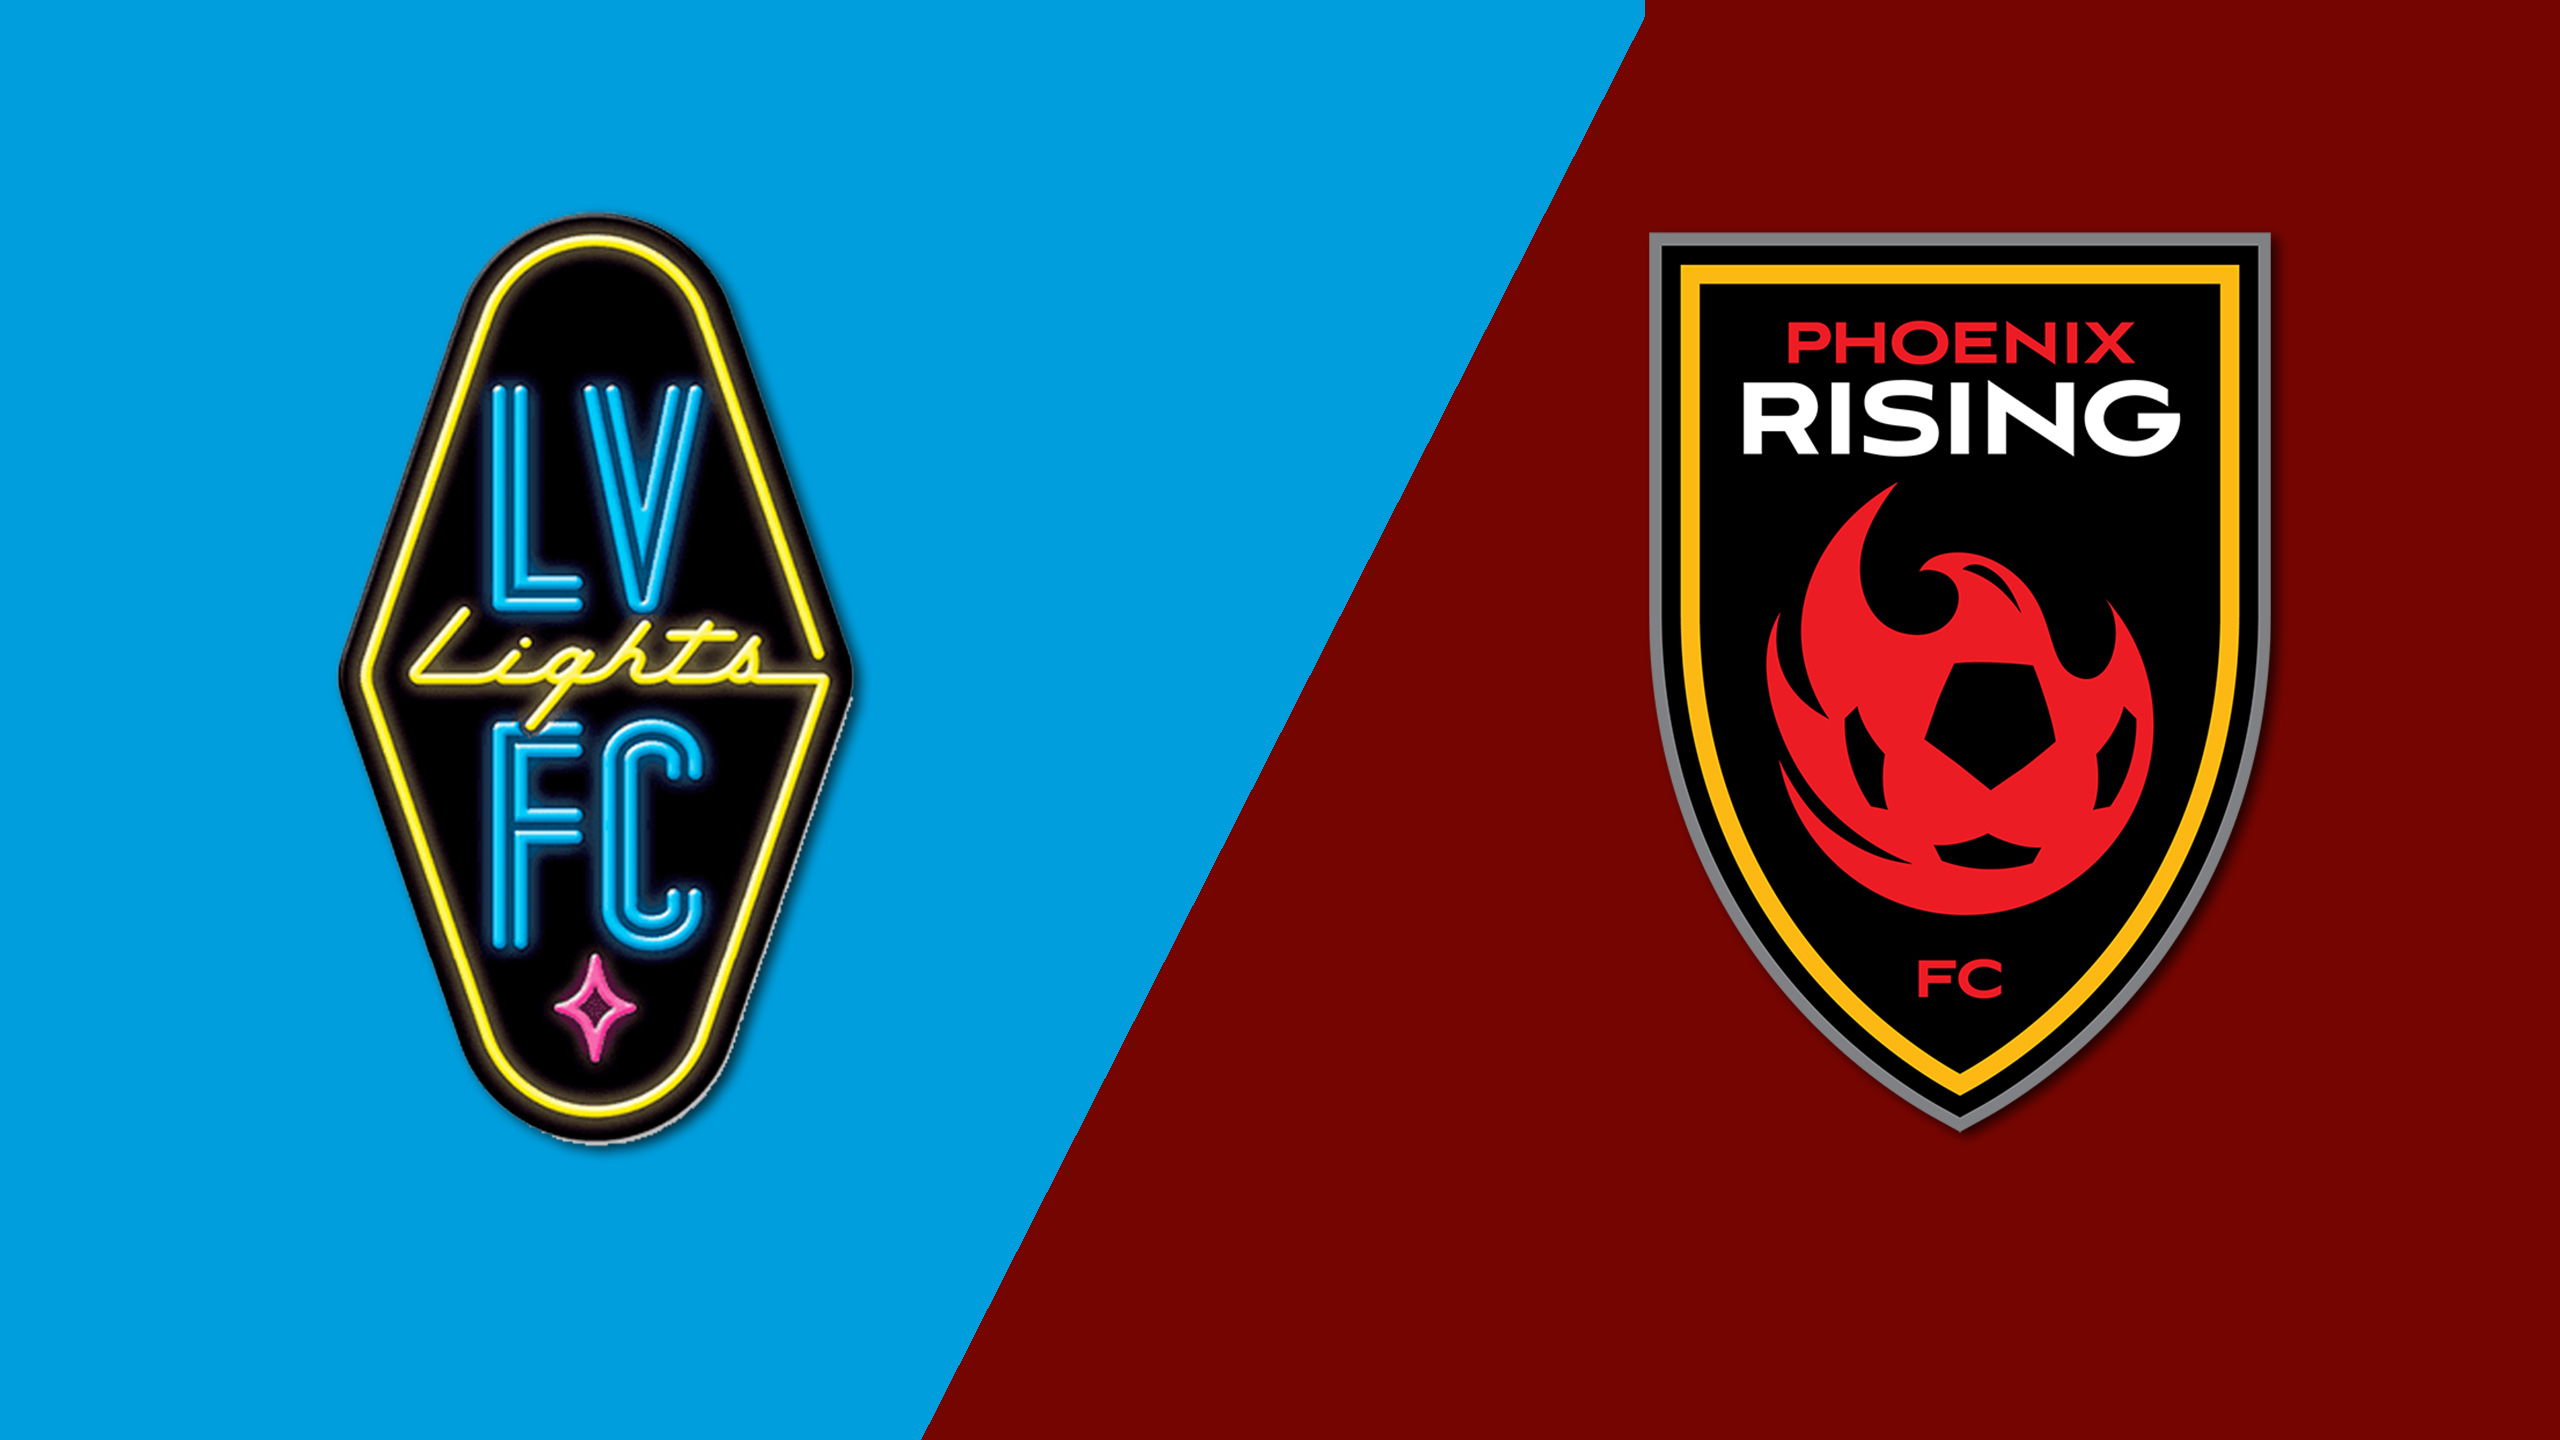 Las Vegas Lights FC vs. Phoenix Rising FC (United Soccer League)